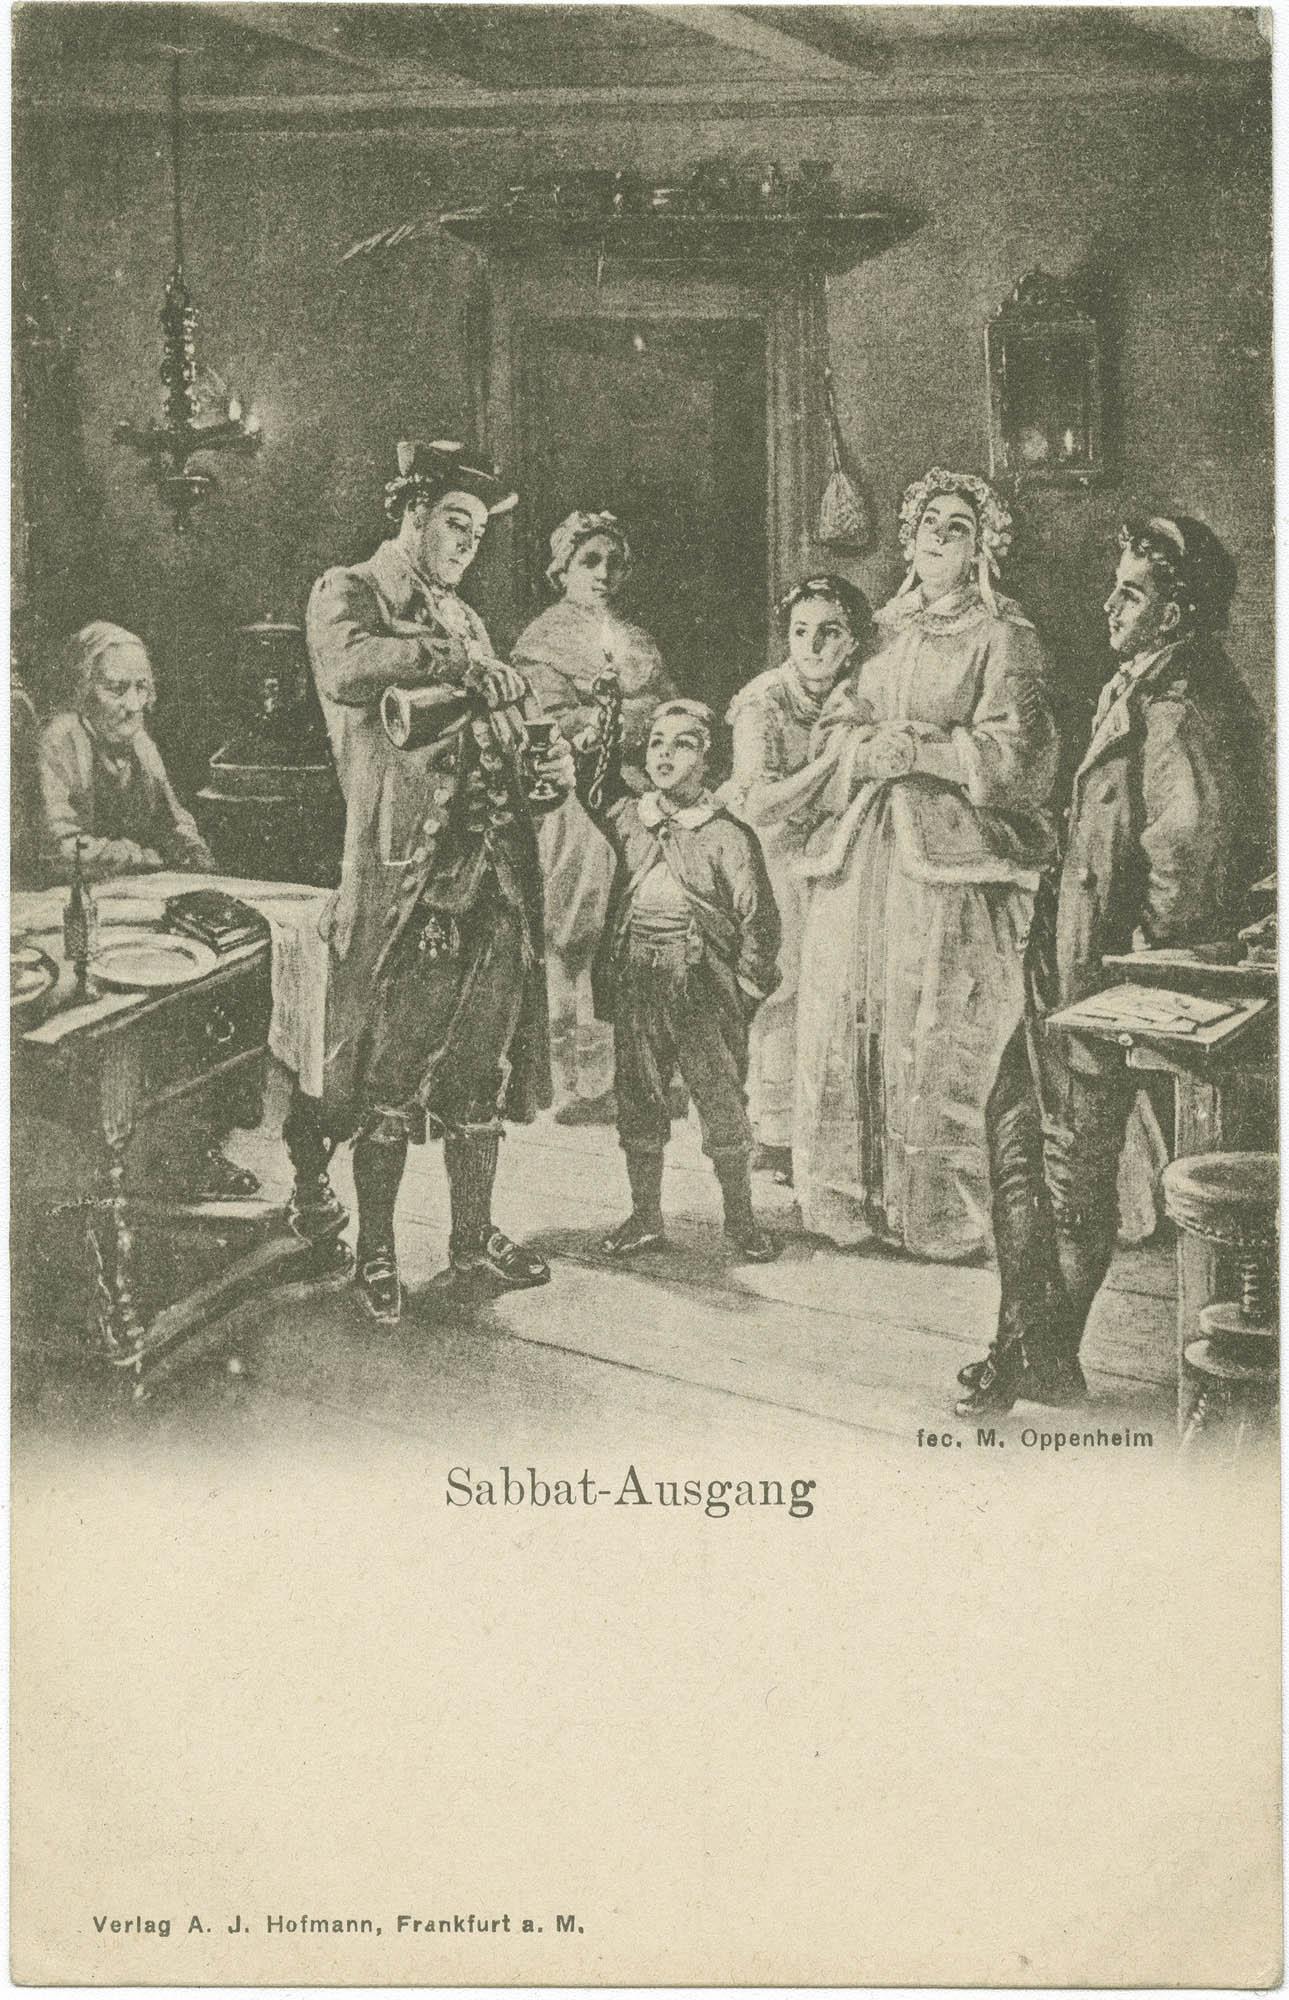 Sabbat-Ausgang